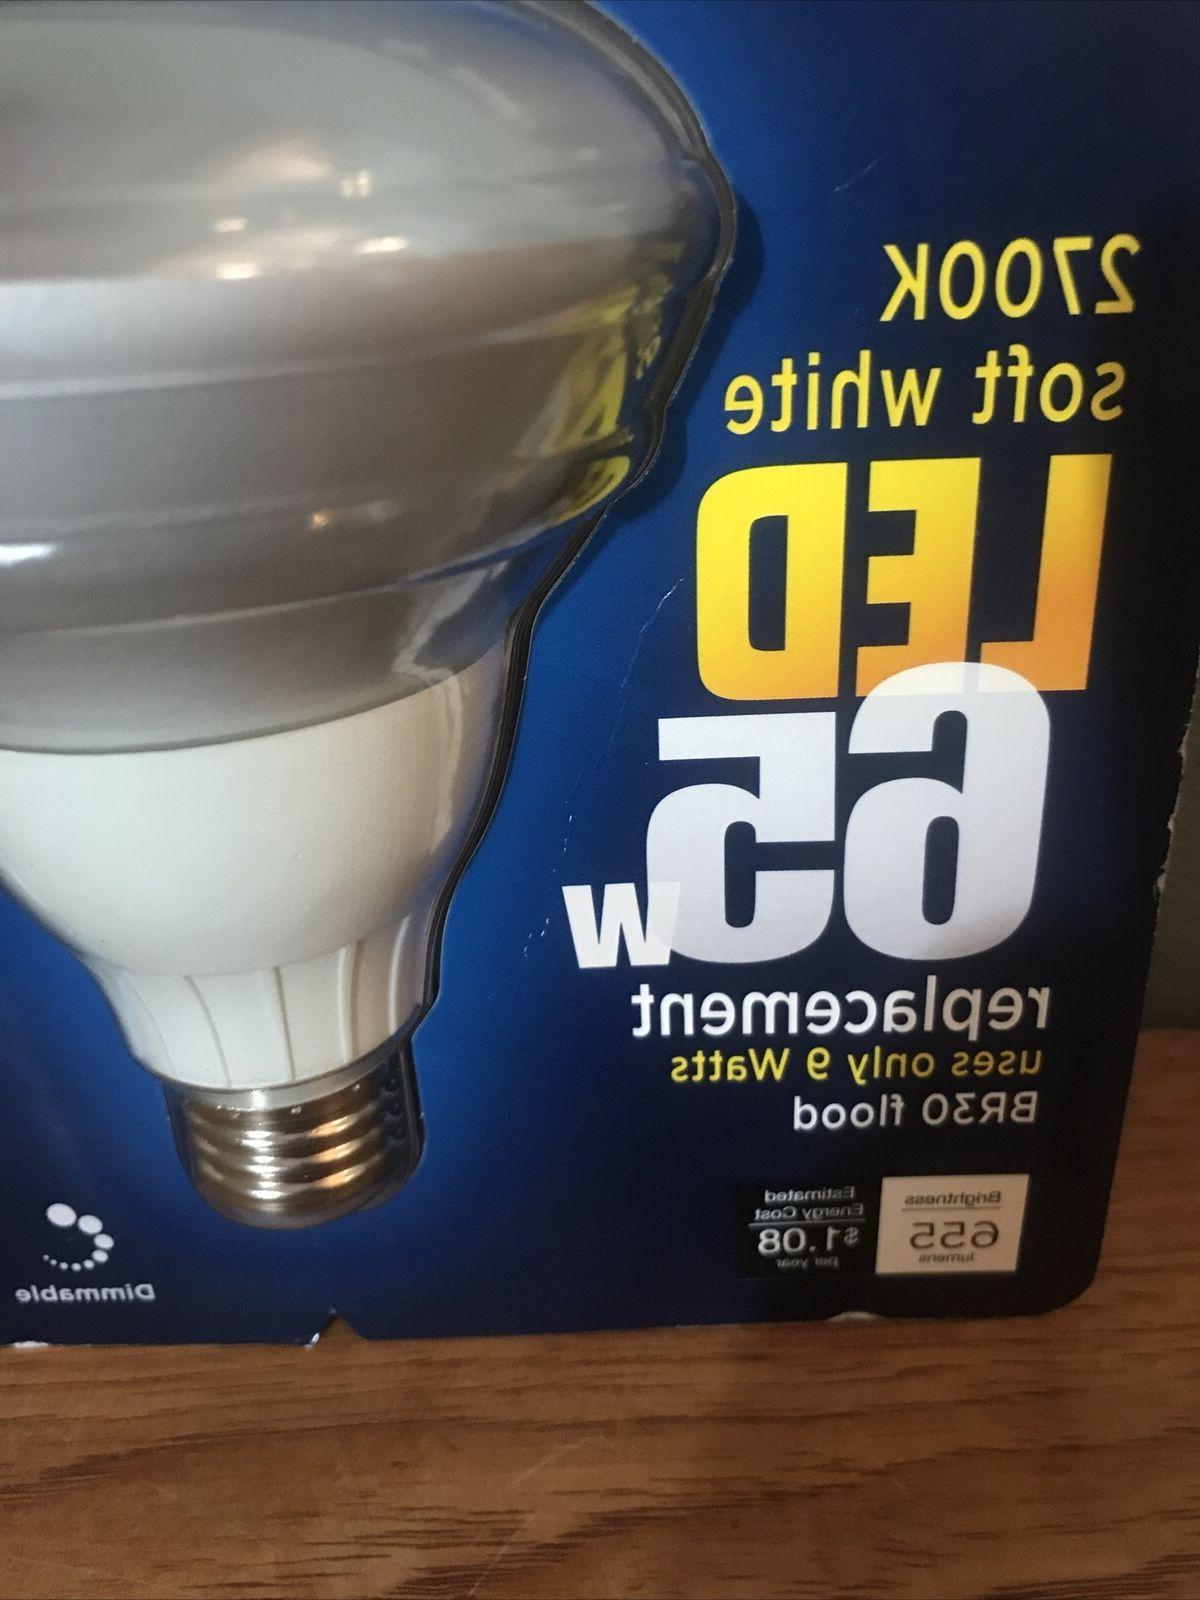 2 Cree 65W BR30 Light Bulb